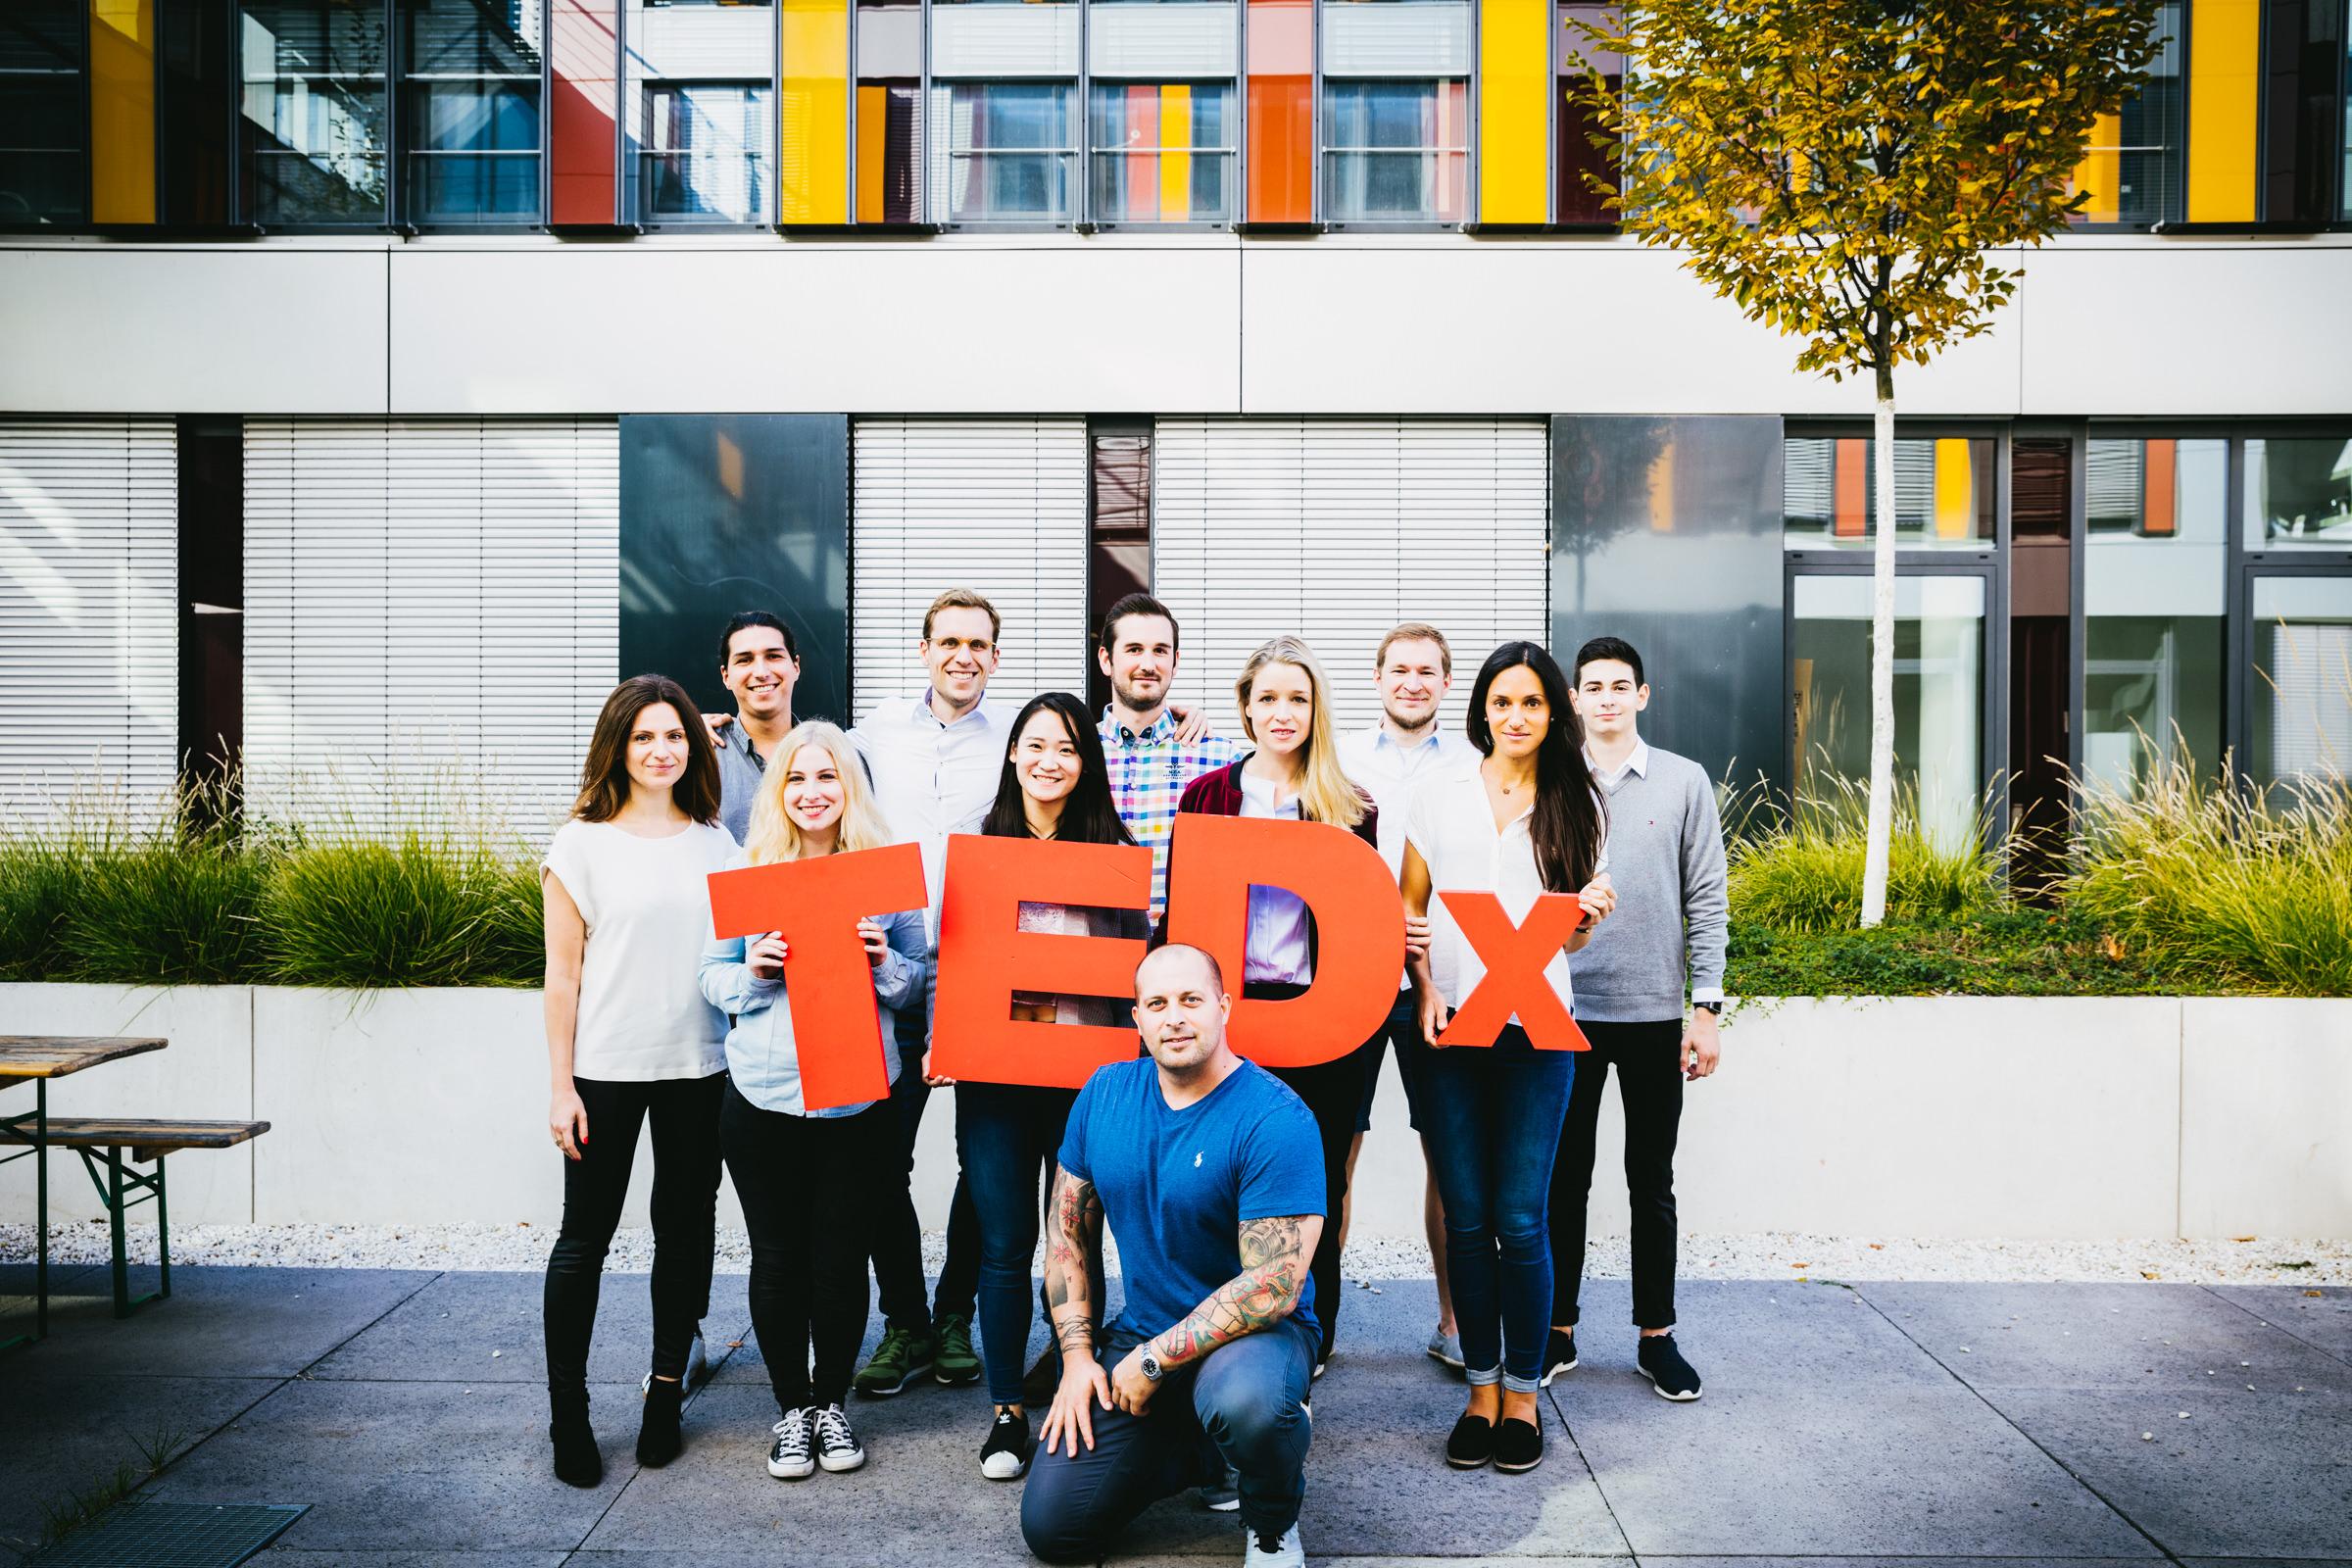 TEDxMannheim